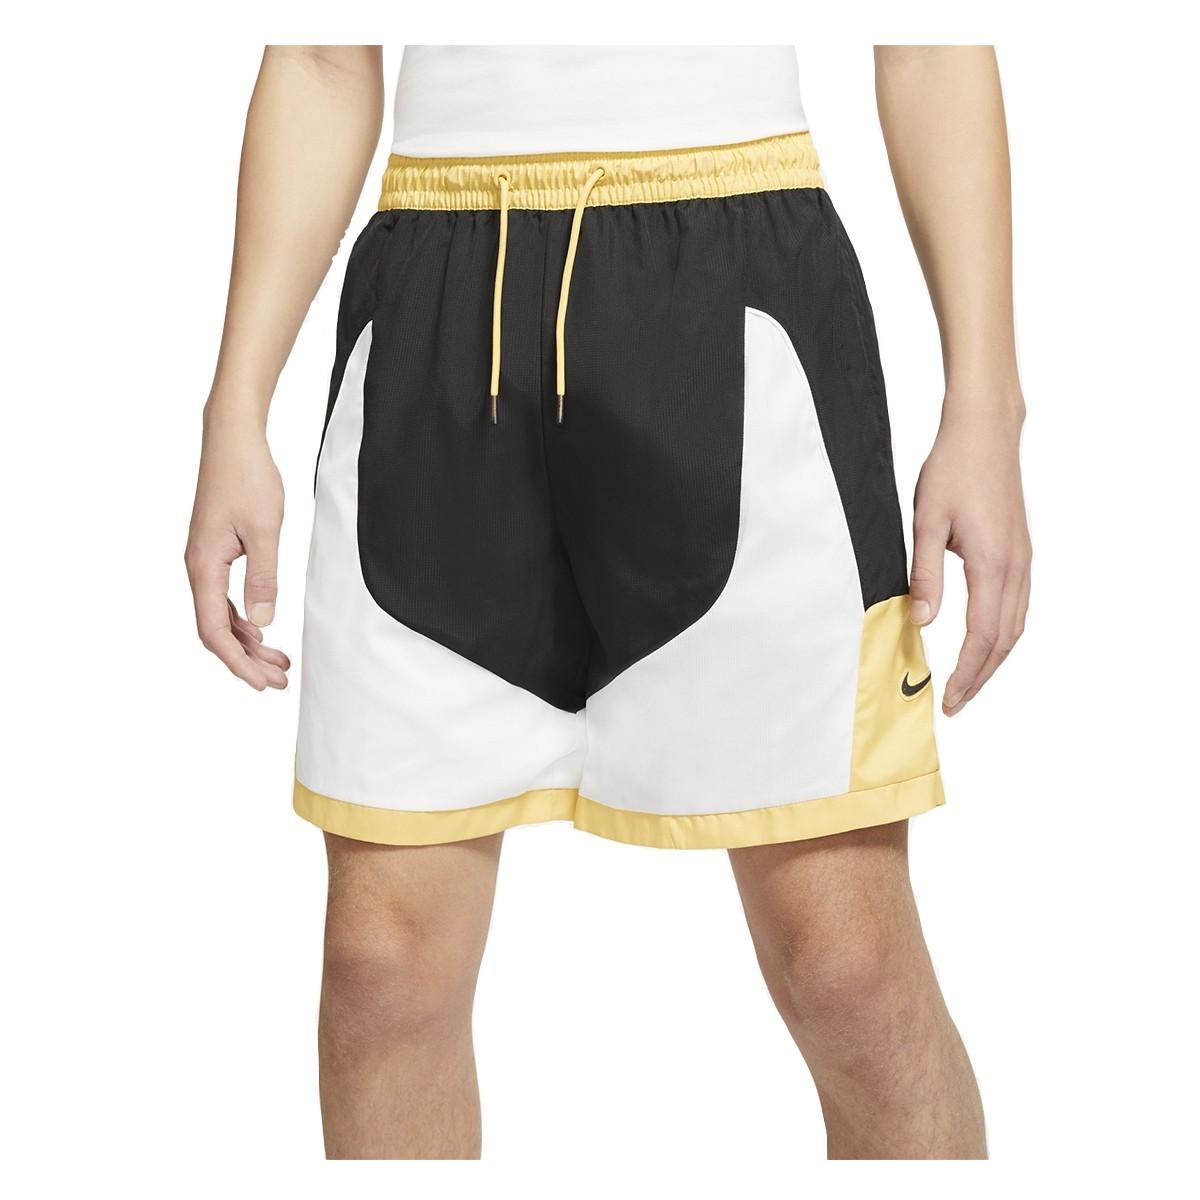 Pantalón corto Nike Throwback Short 'Narrative'